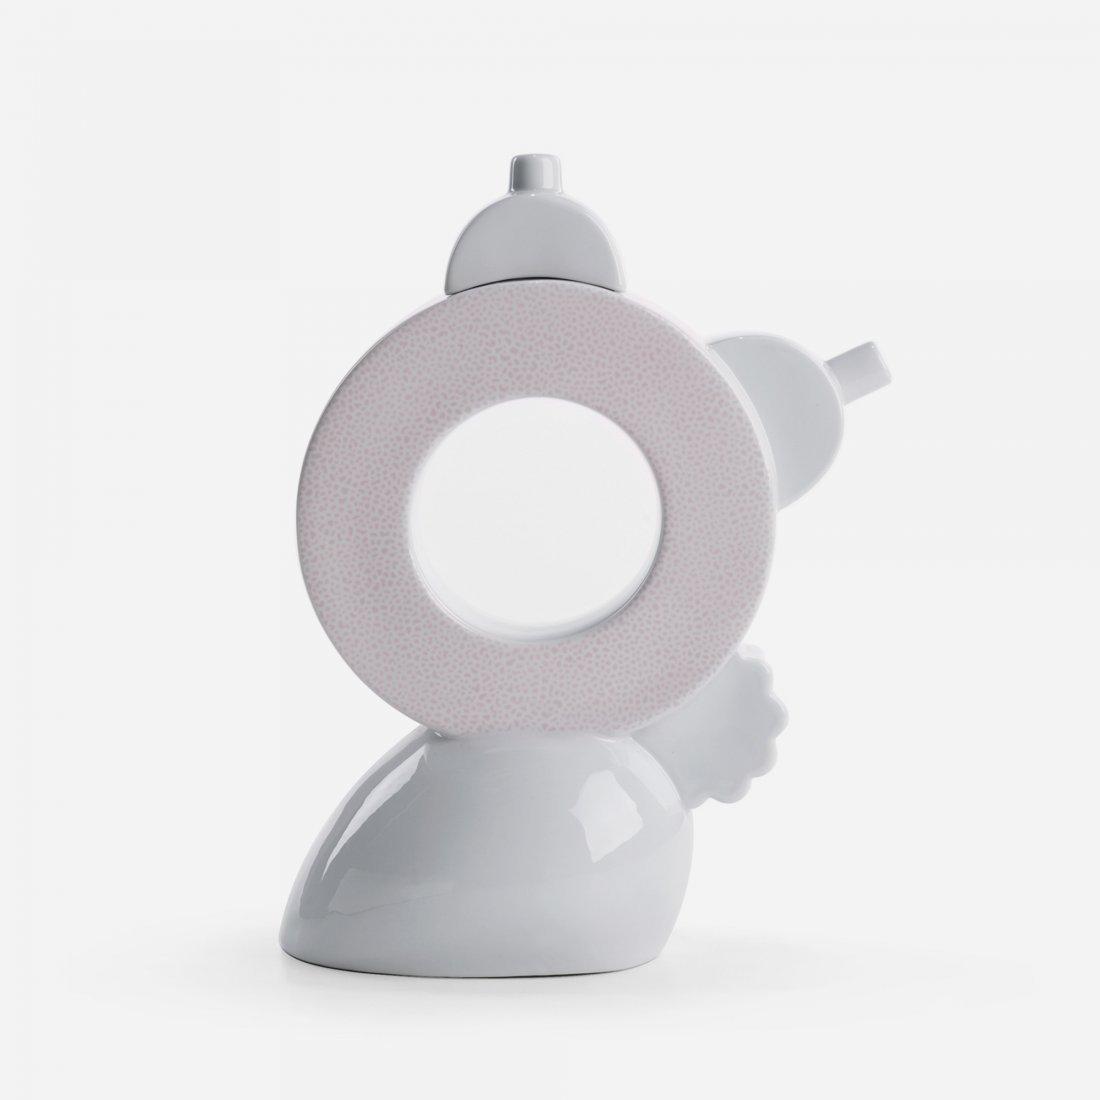 569: Matteo Thun teapot